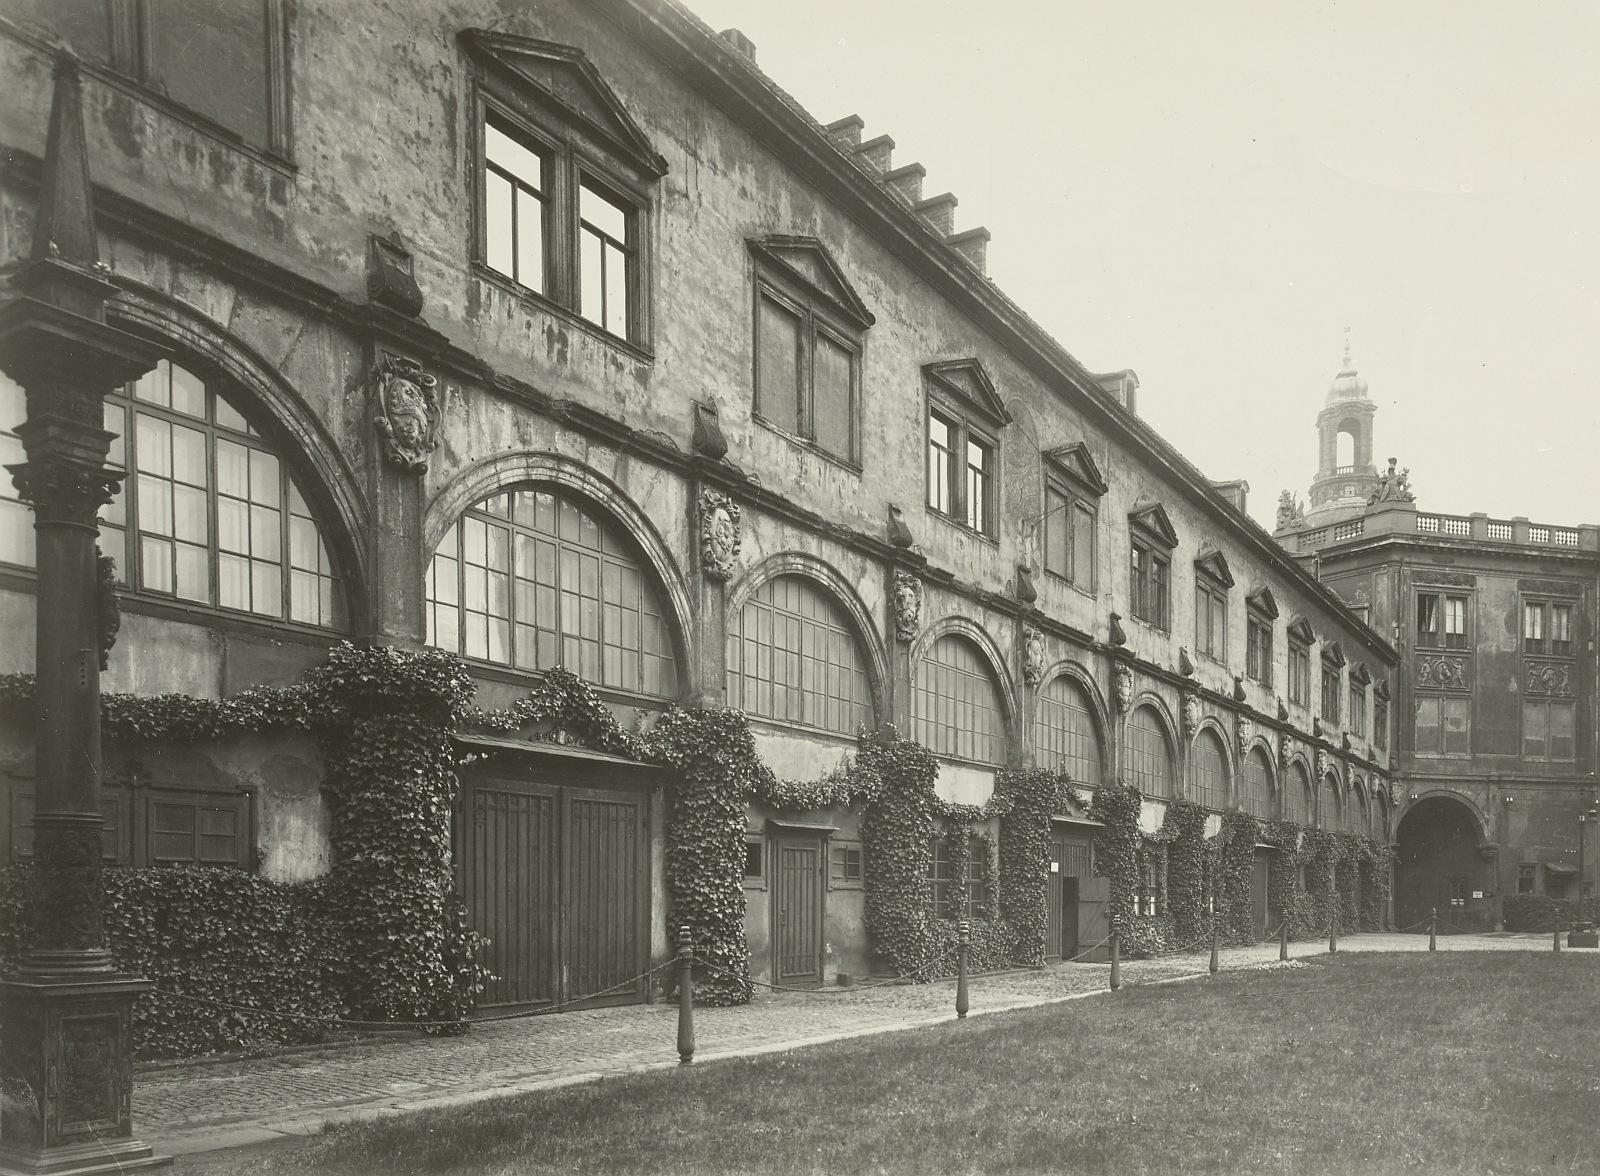 Stallhof vor dem Umbau 1933/34